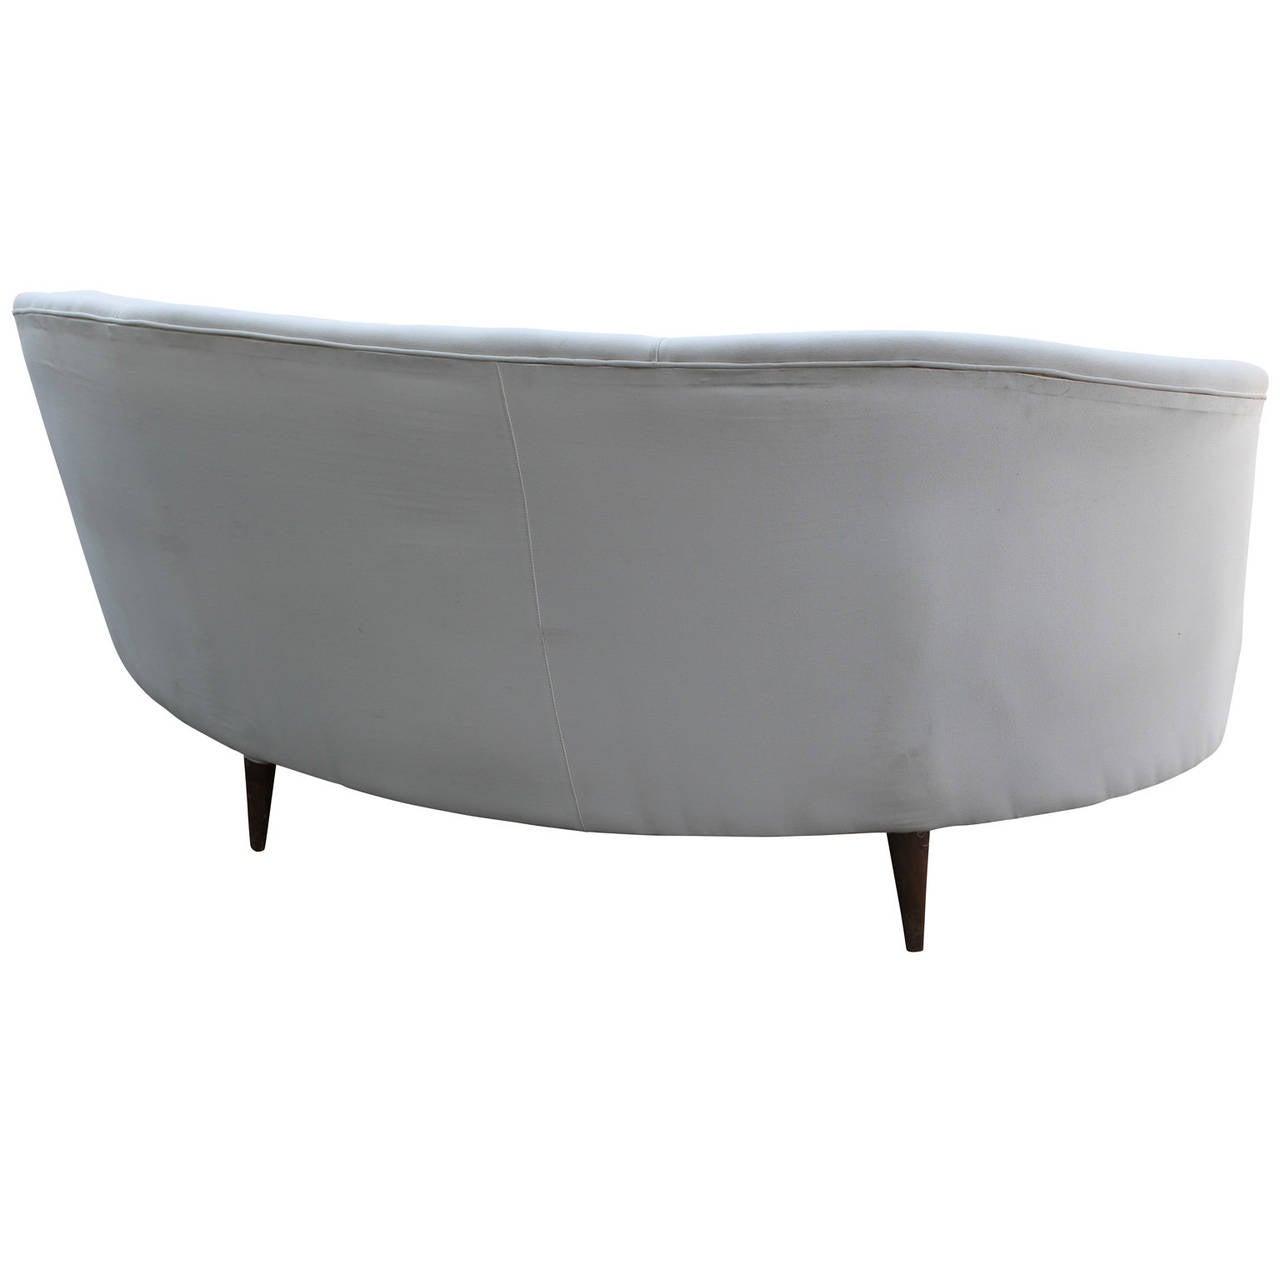 Mid-20th Century Curved White Italian Sofa